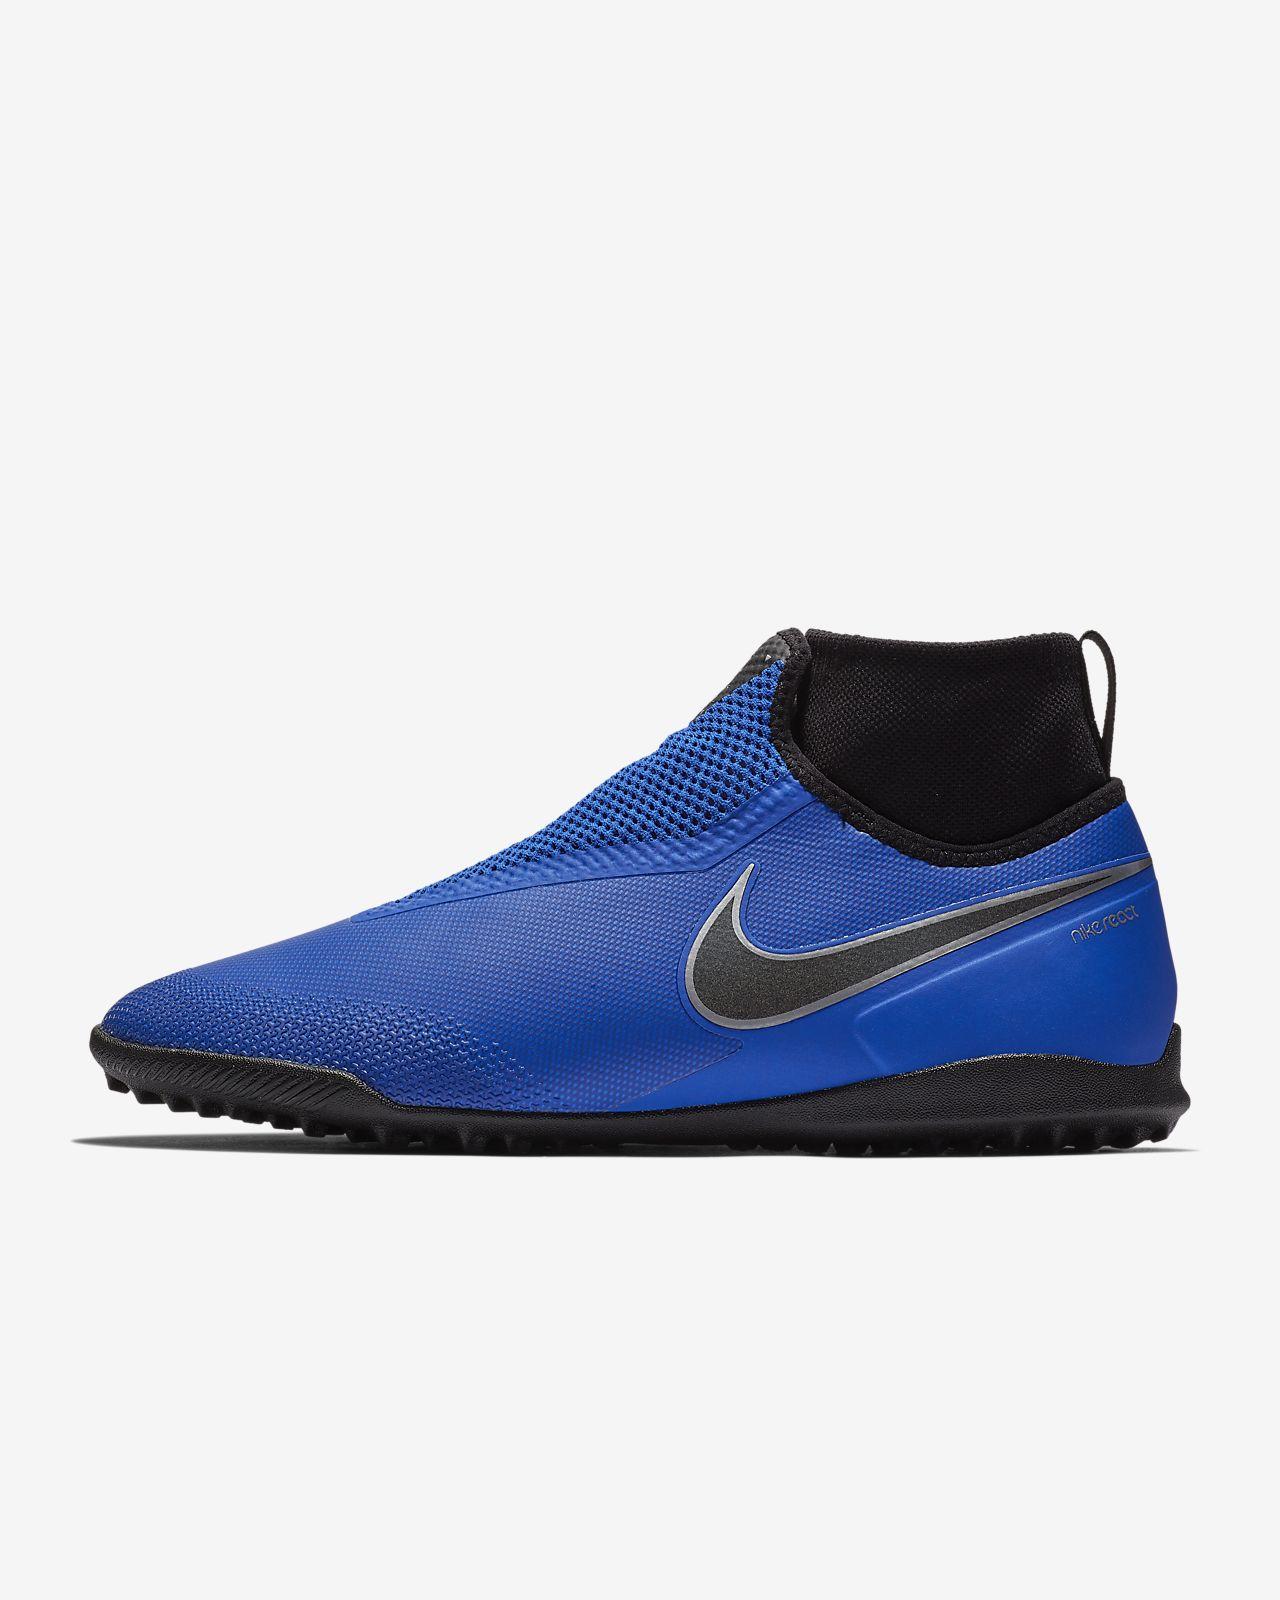 Phantomvsn Sintetica Nike Ssbqz1p Erba Da Pro Calcio Per Scarpa React qB7aIw8B